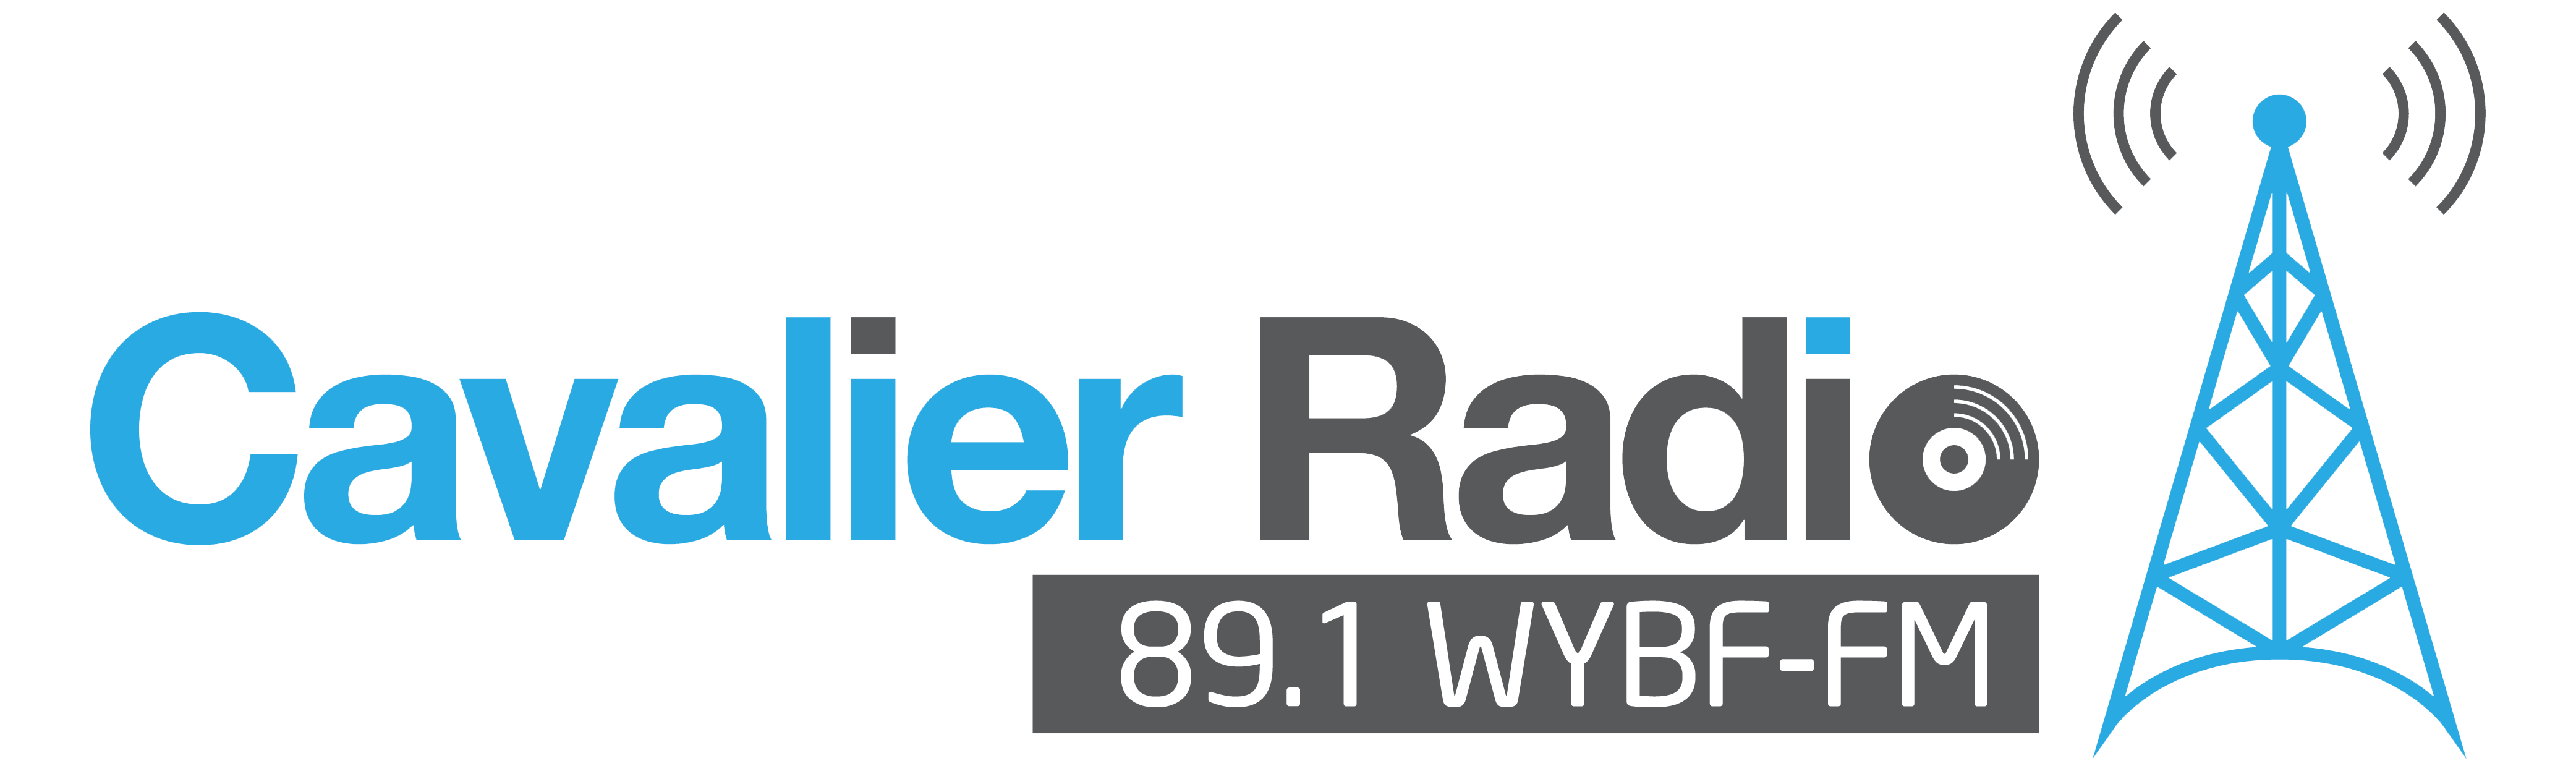 Cavalier Radio - 89.1 WYBF FM